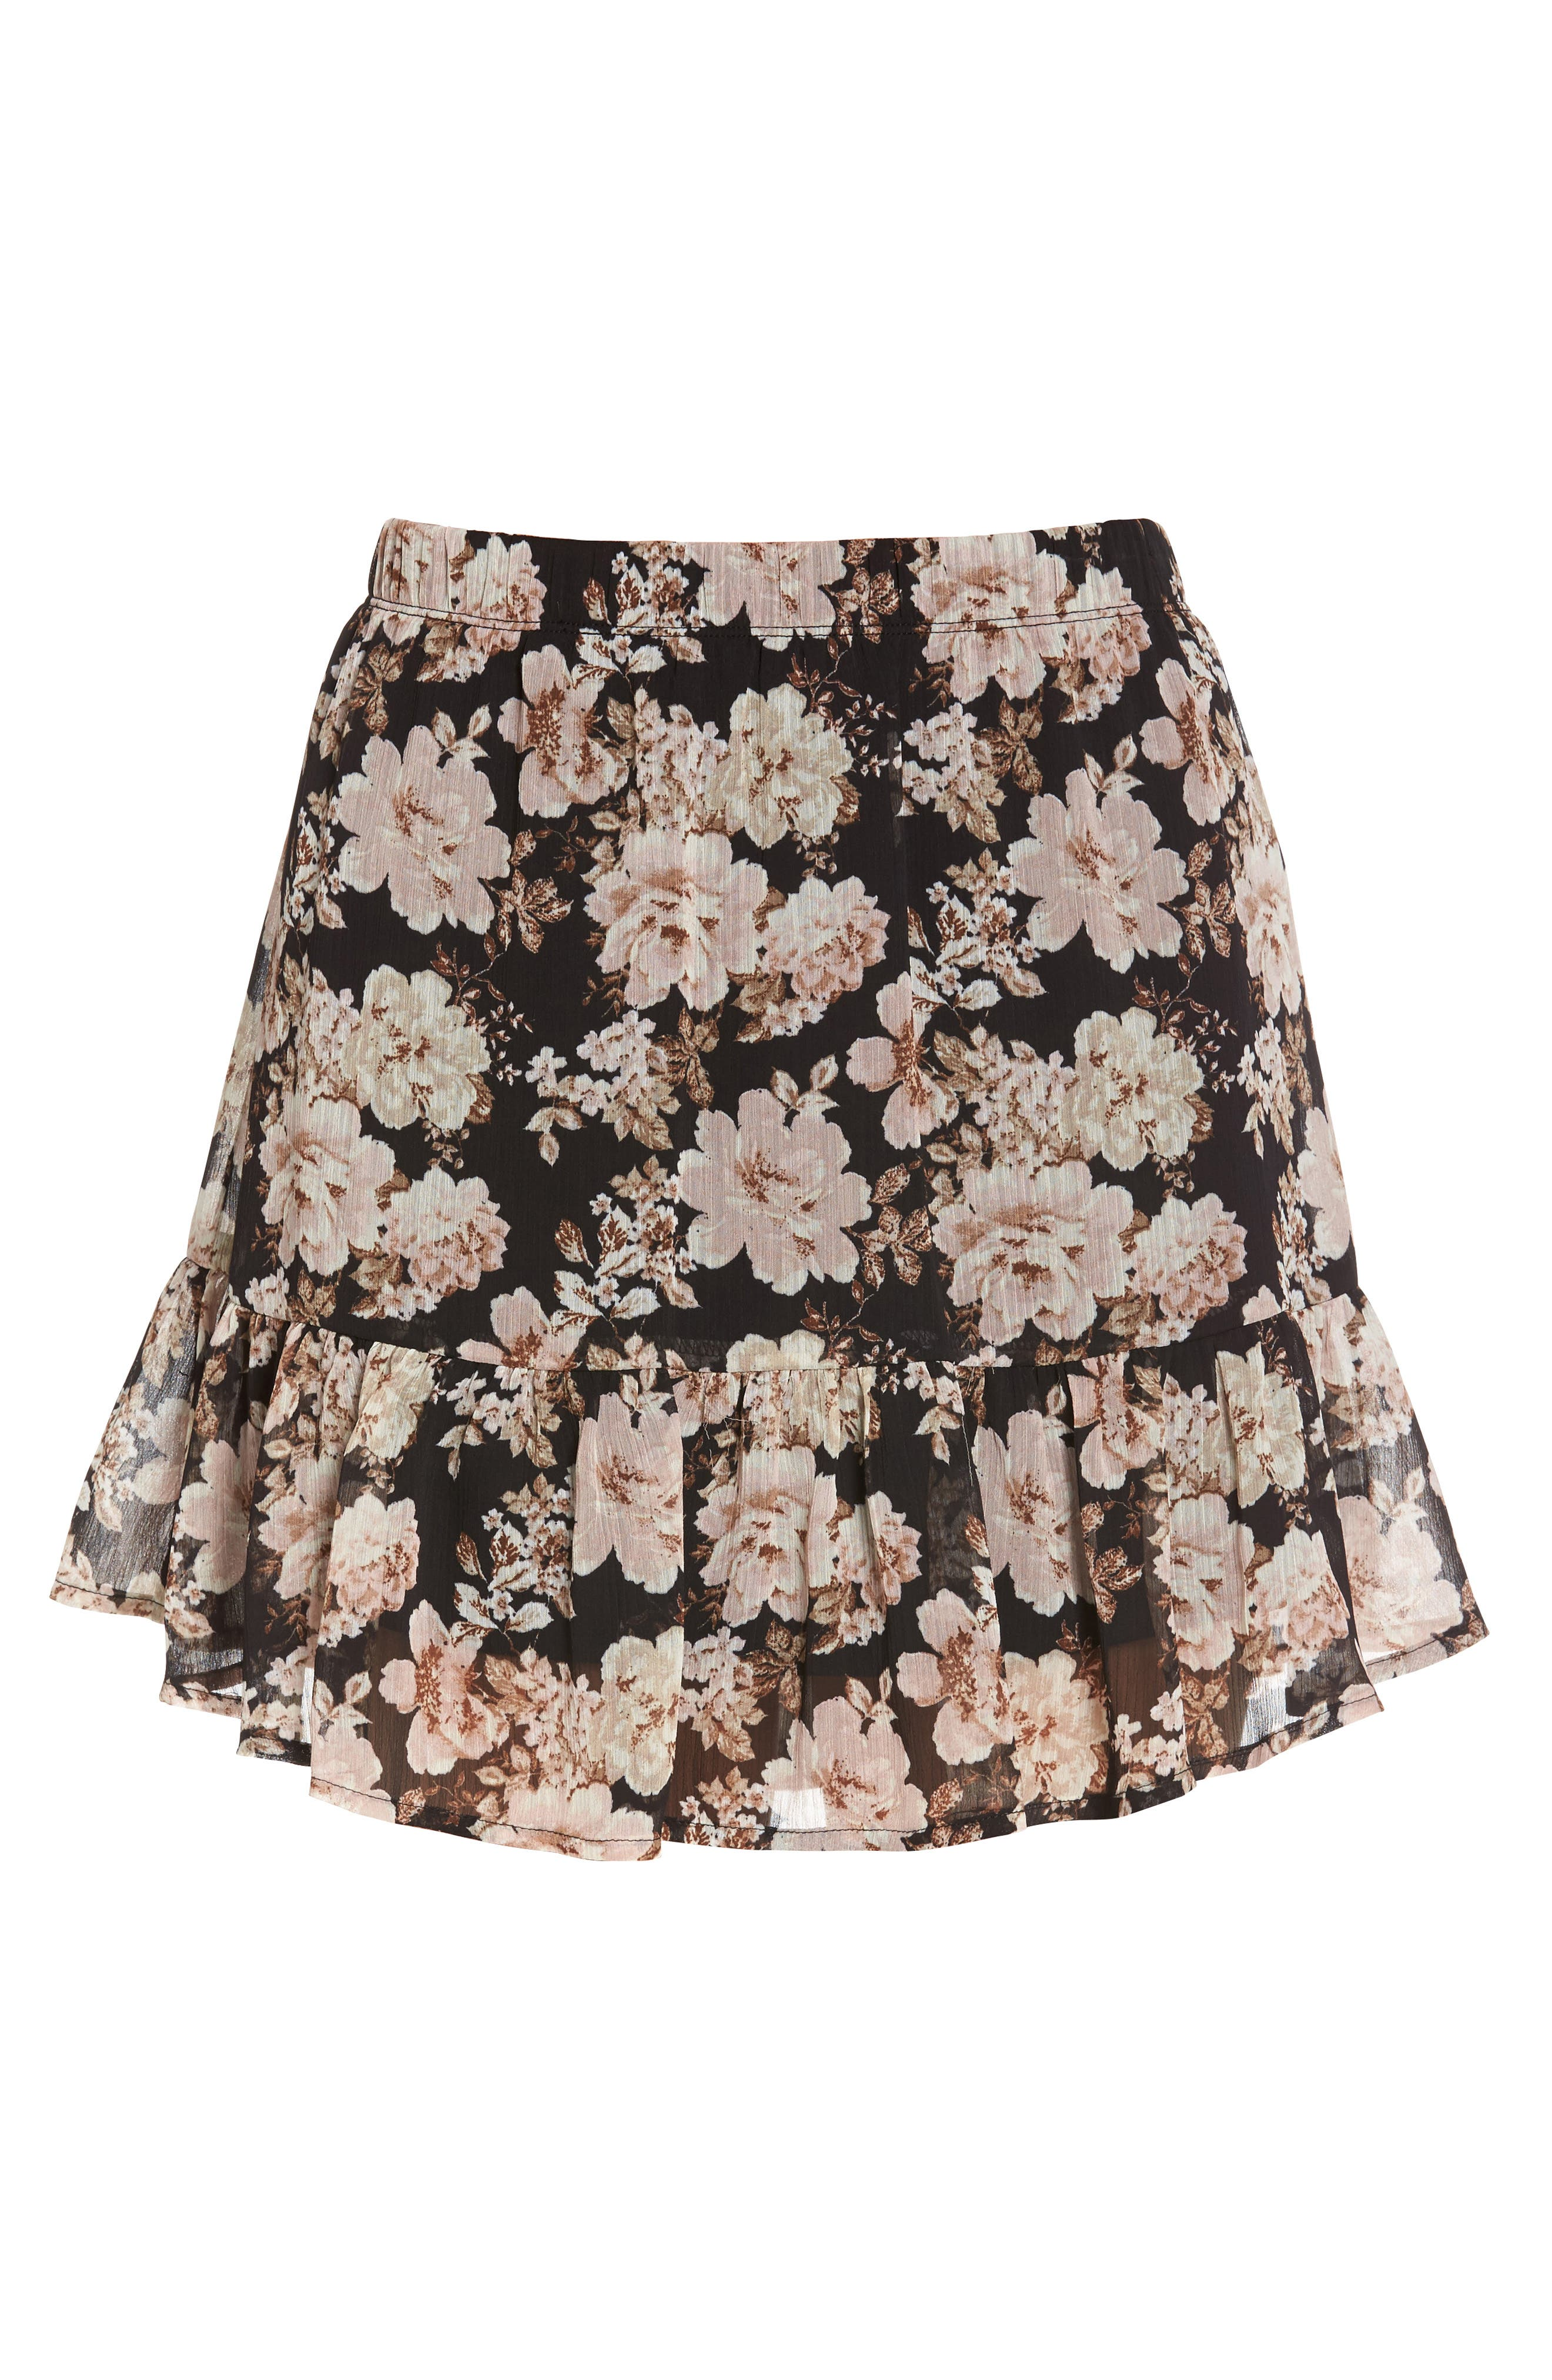 Floral Print Drop Waist Skirt,                             Alternate thumbnail 6, color,                             001